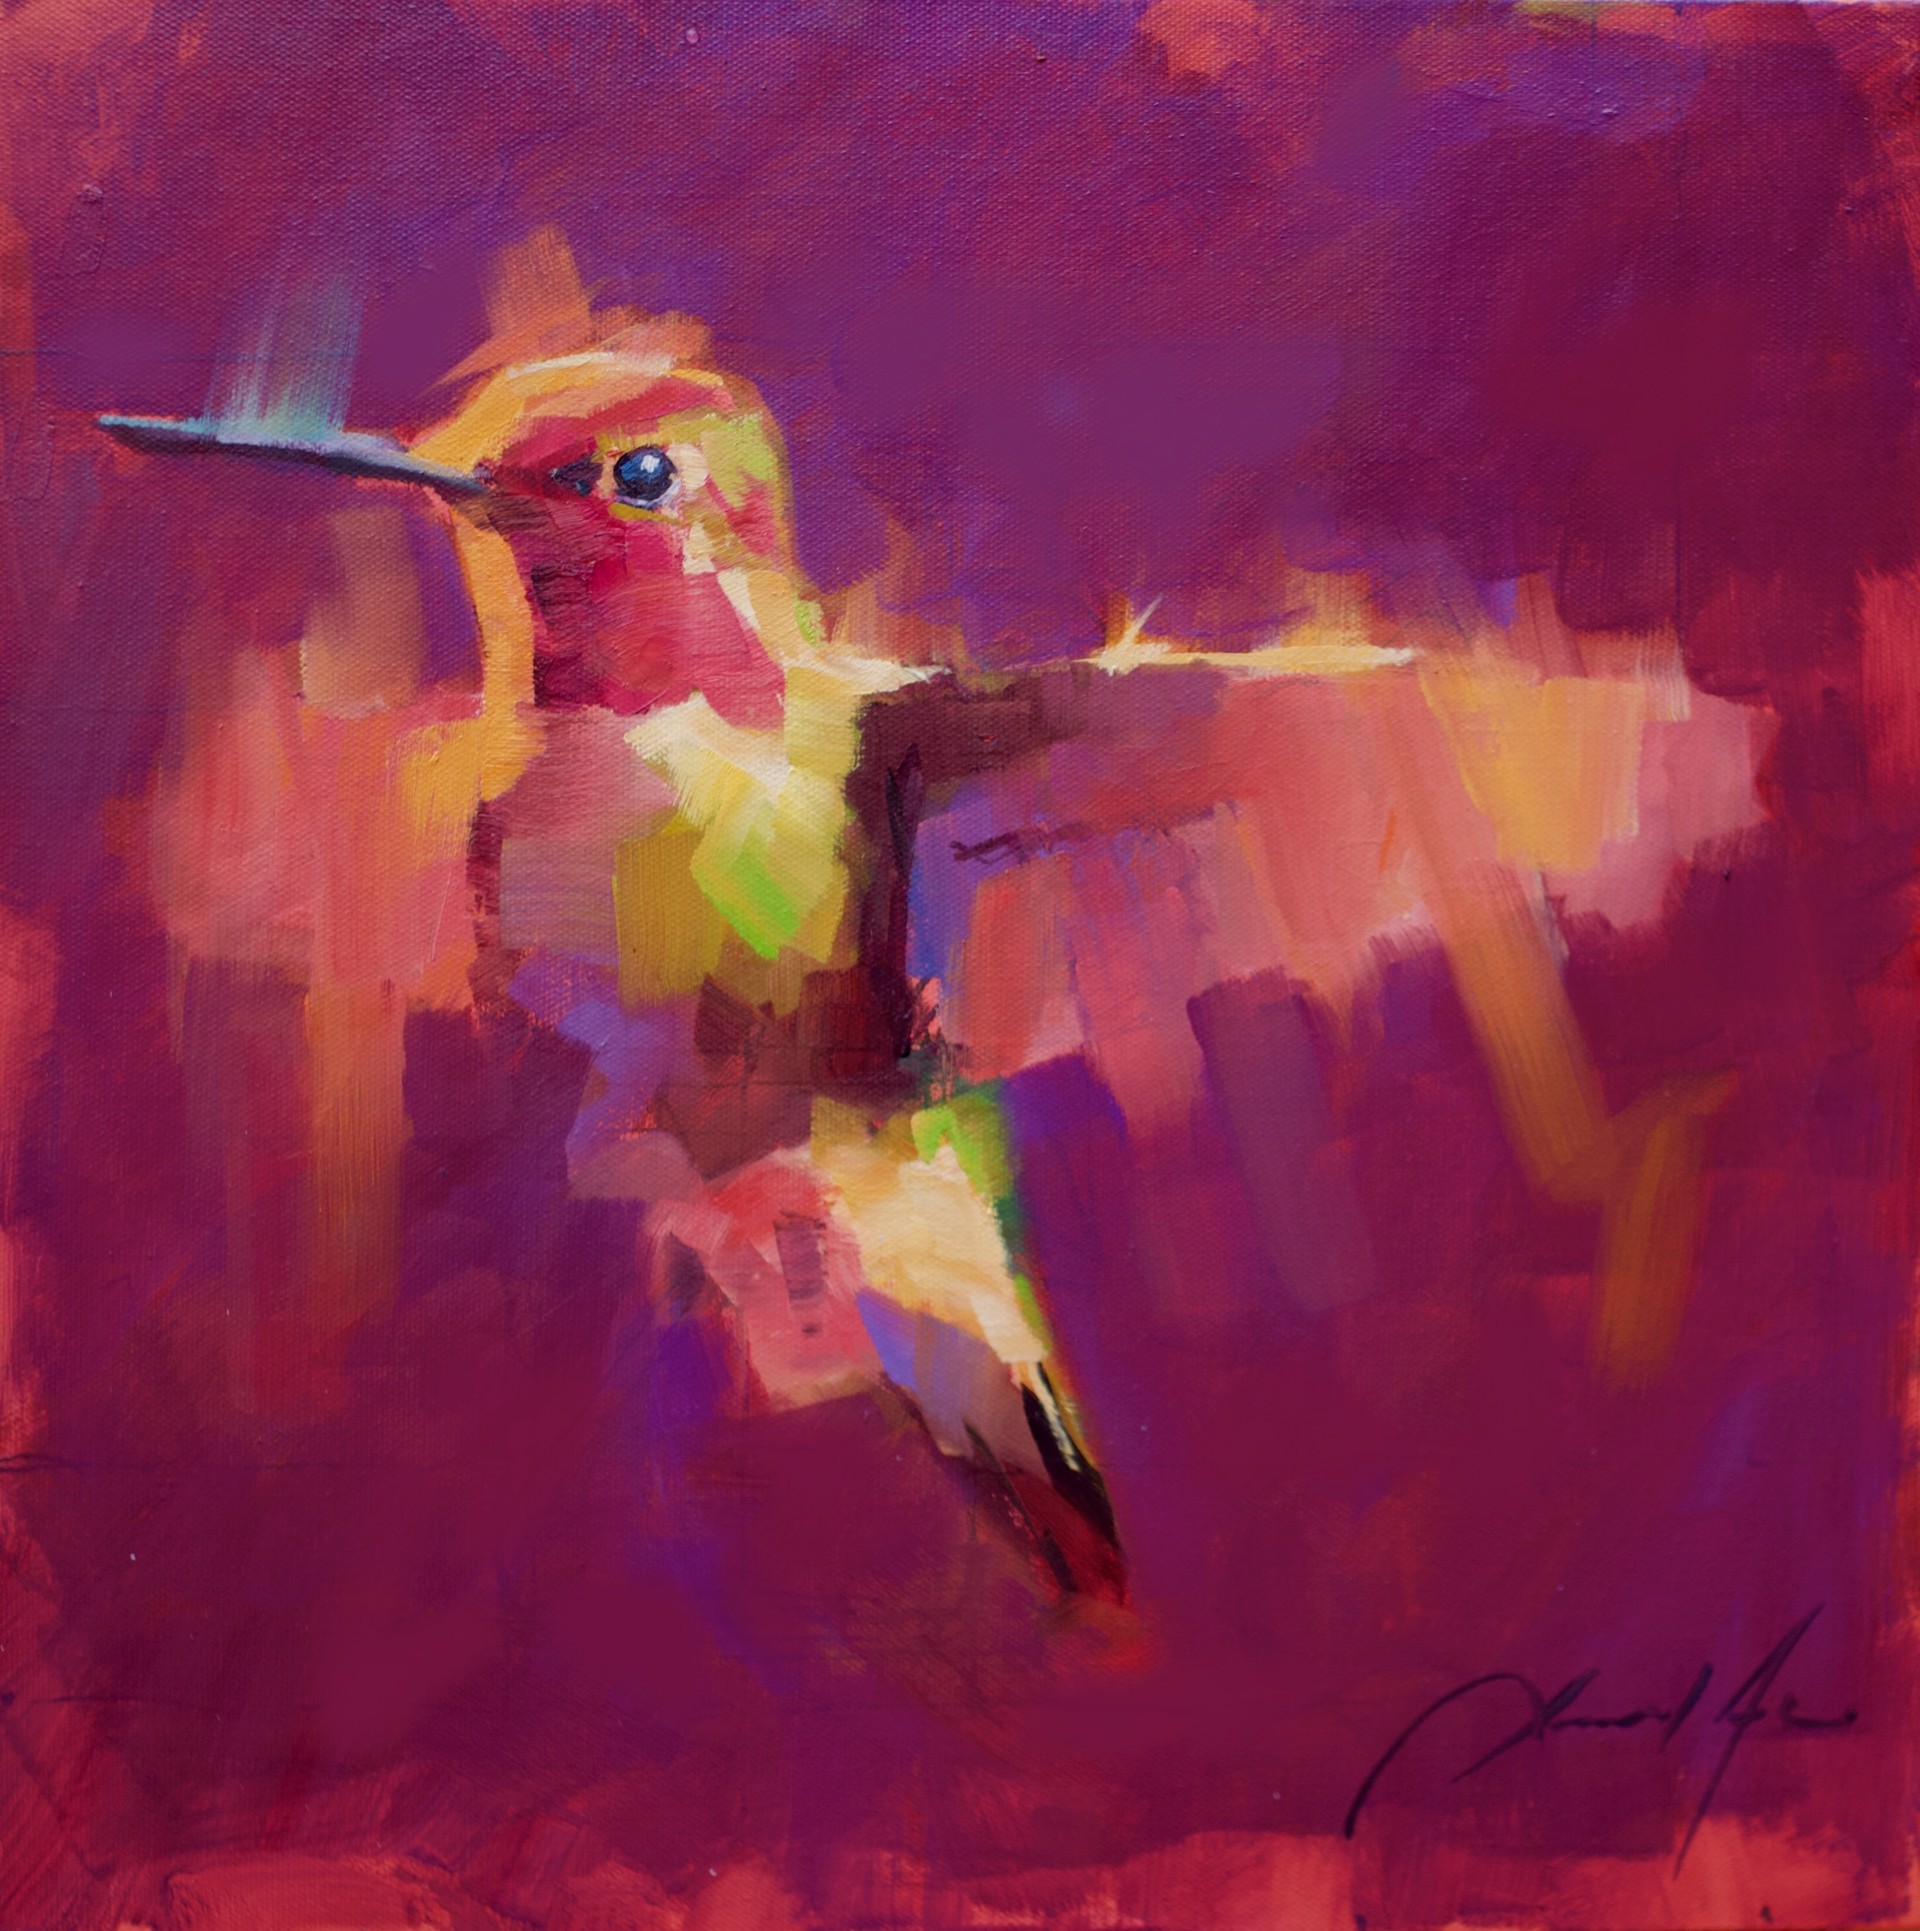 Hummingbird XV by Jamel Akib